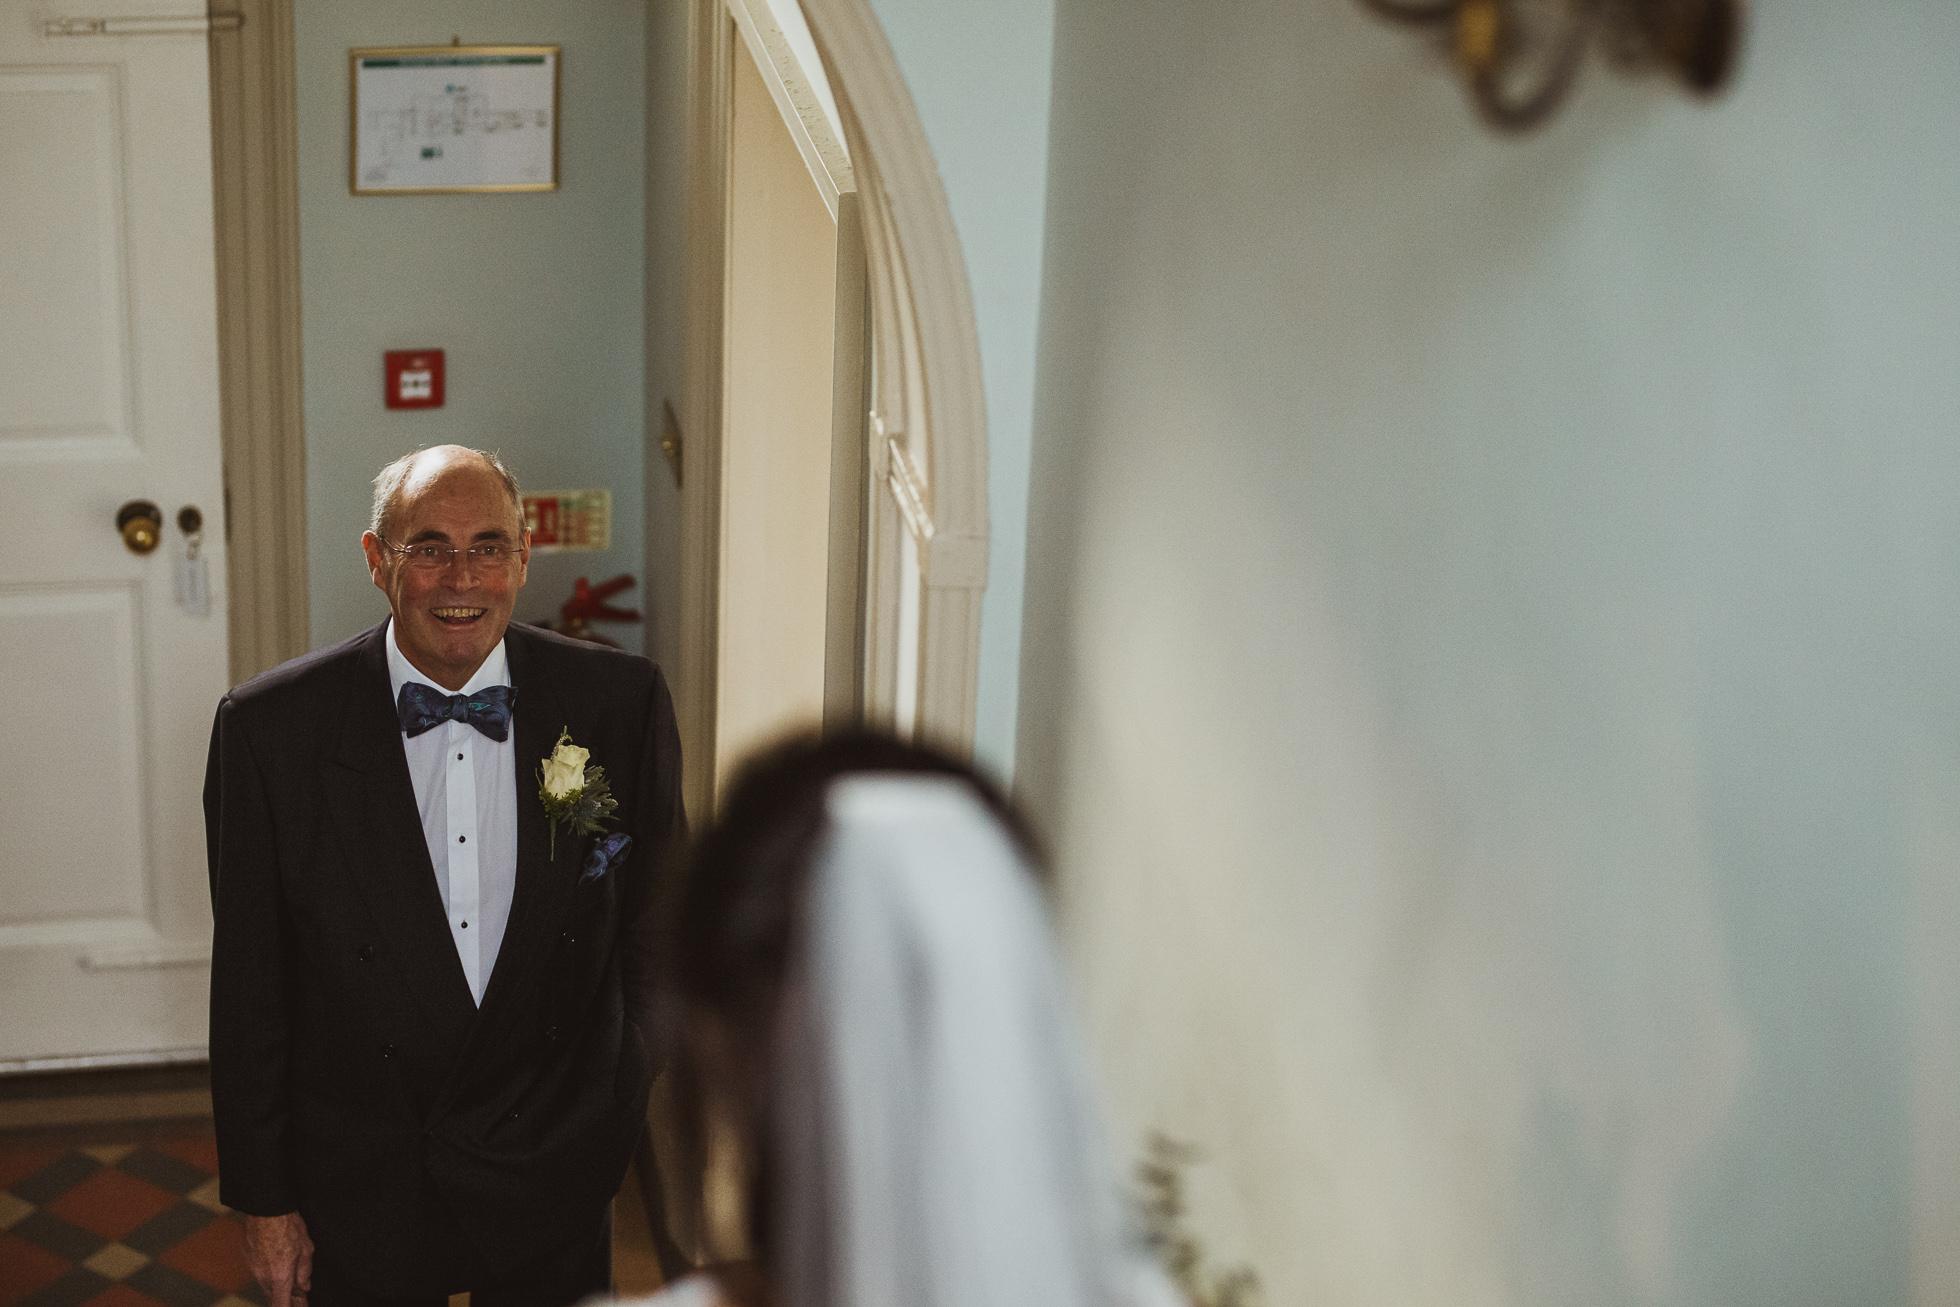 hornington_manor_wedding_photographer-40.jpg